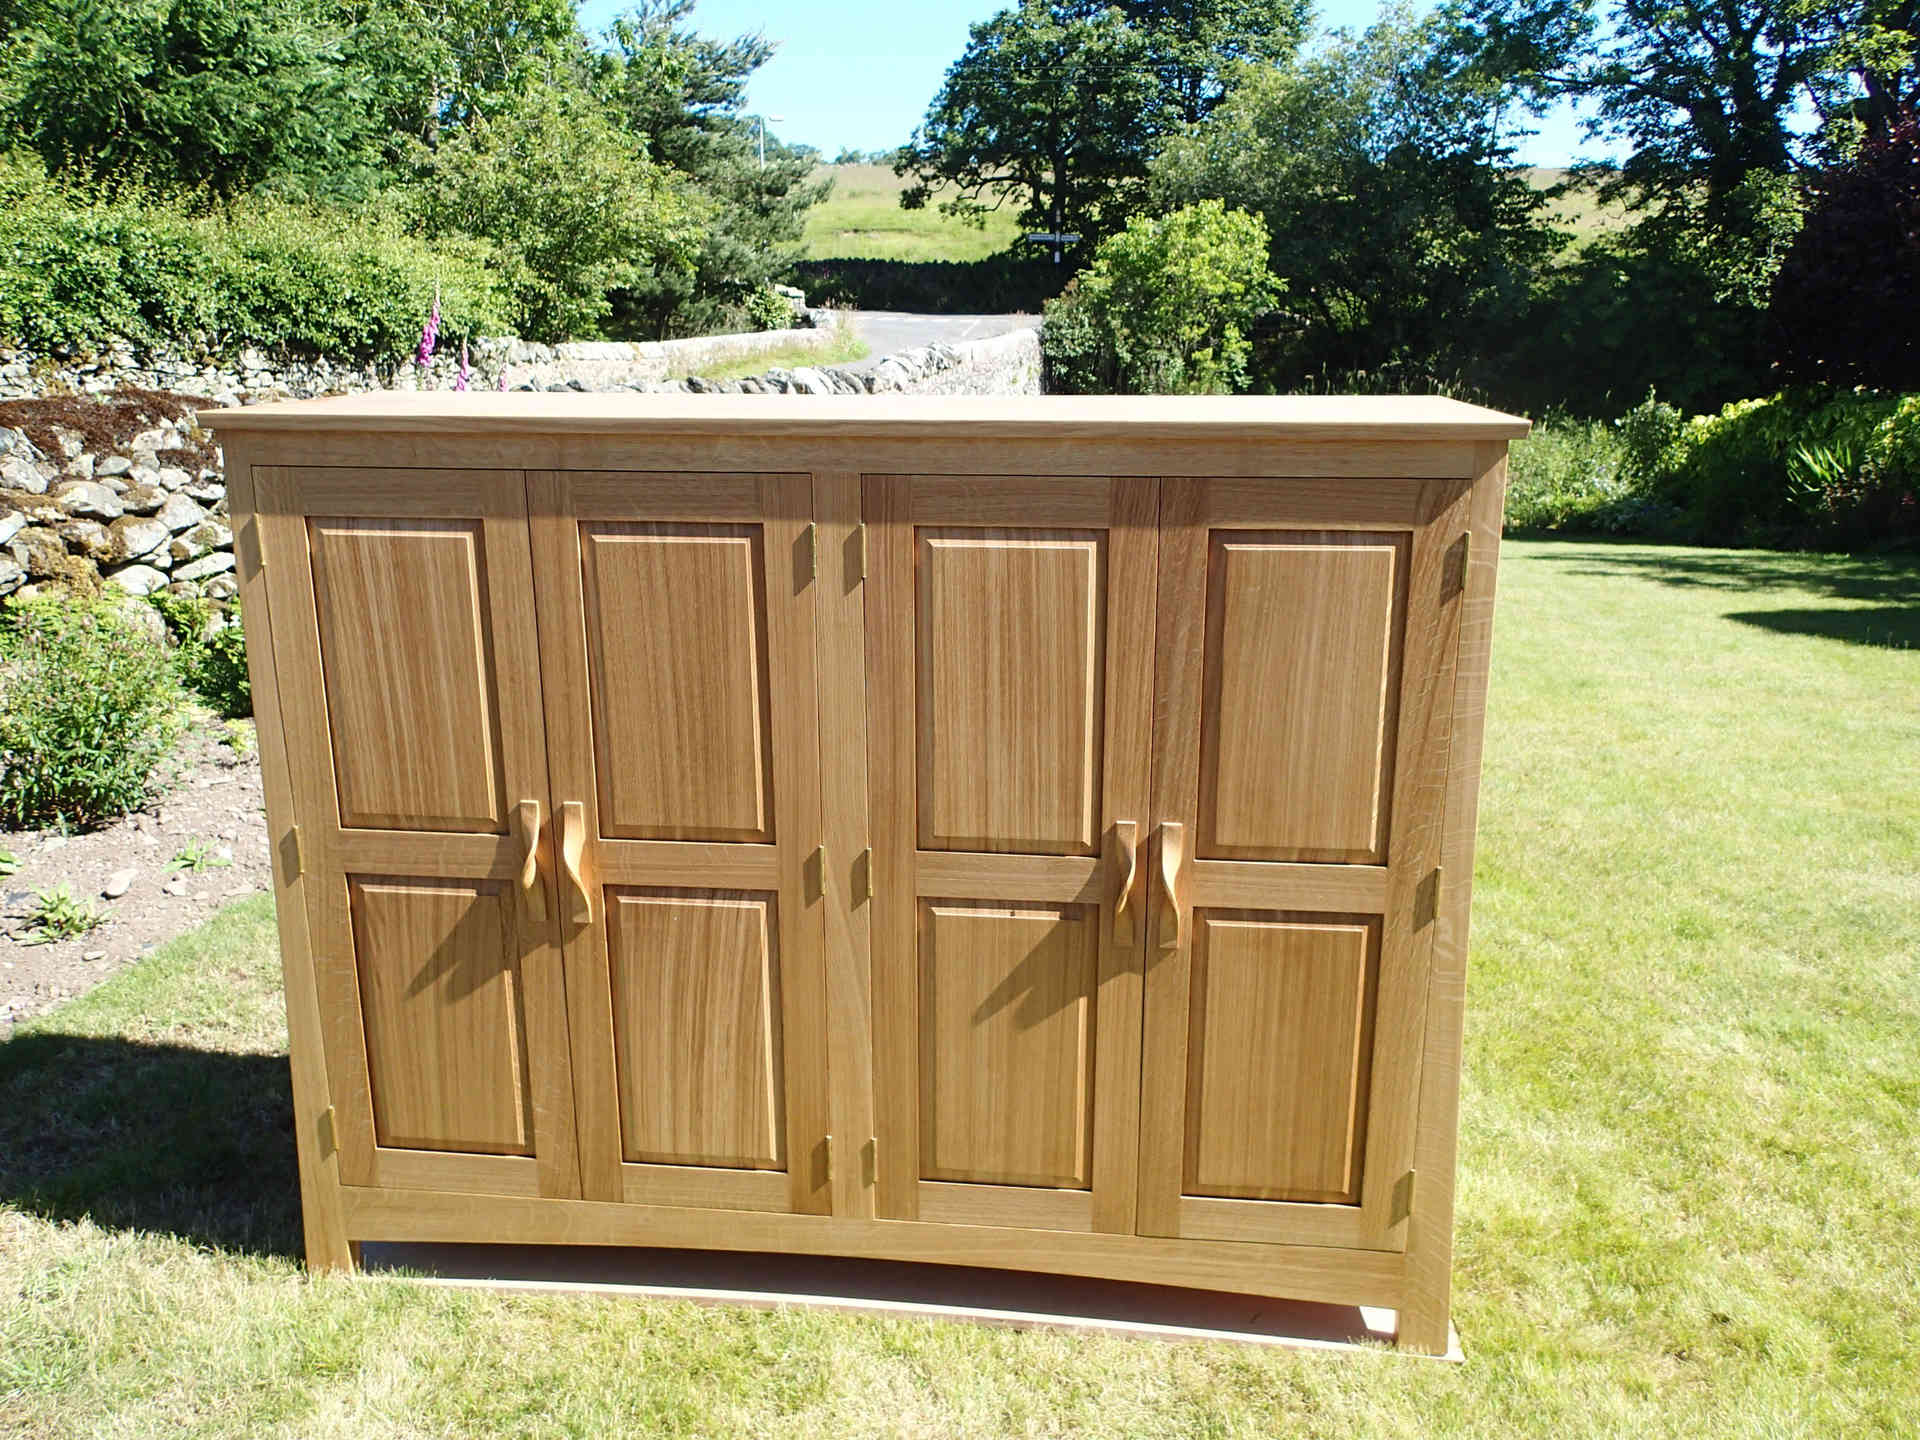 Oak cupboard with raised panels in the doors